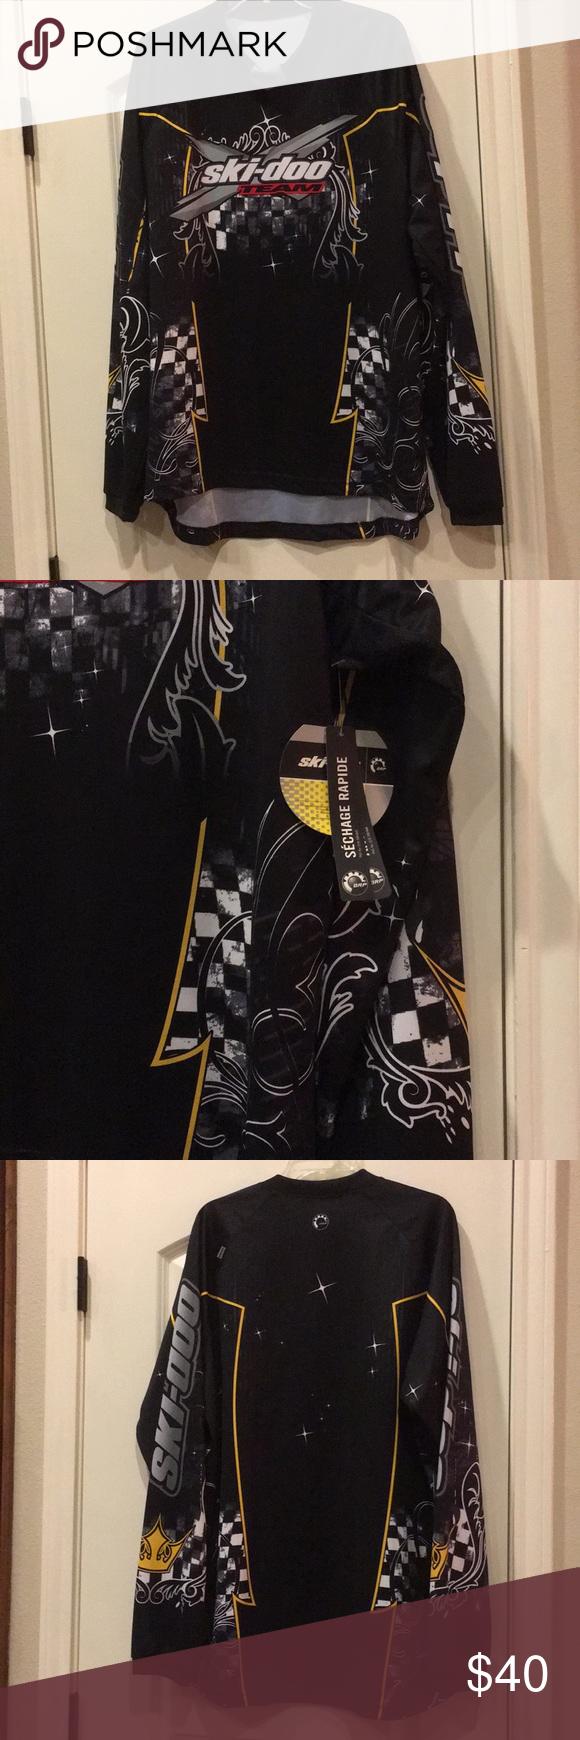 Motor Sports Jersey Clothes Design Fashion Fashion Design